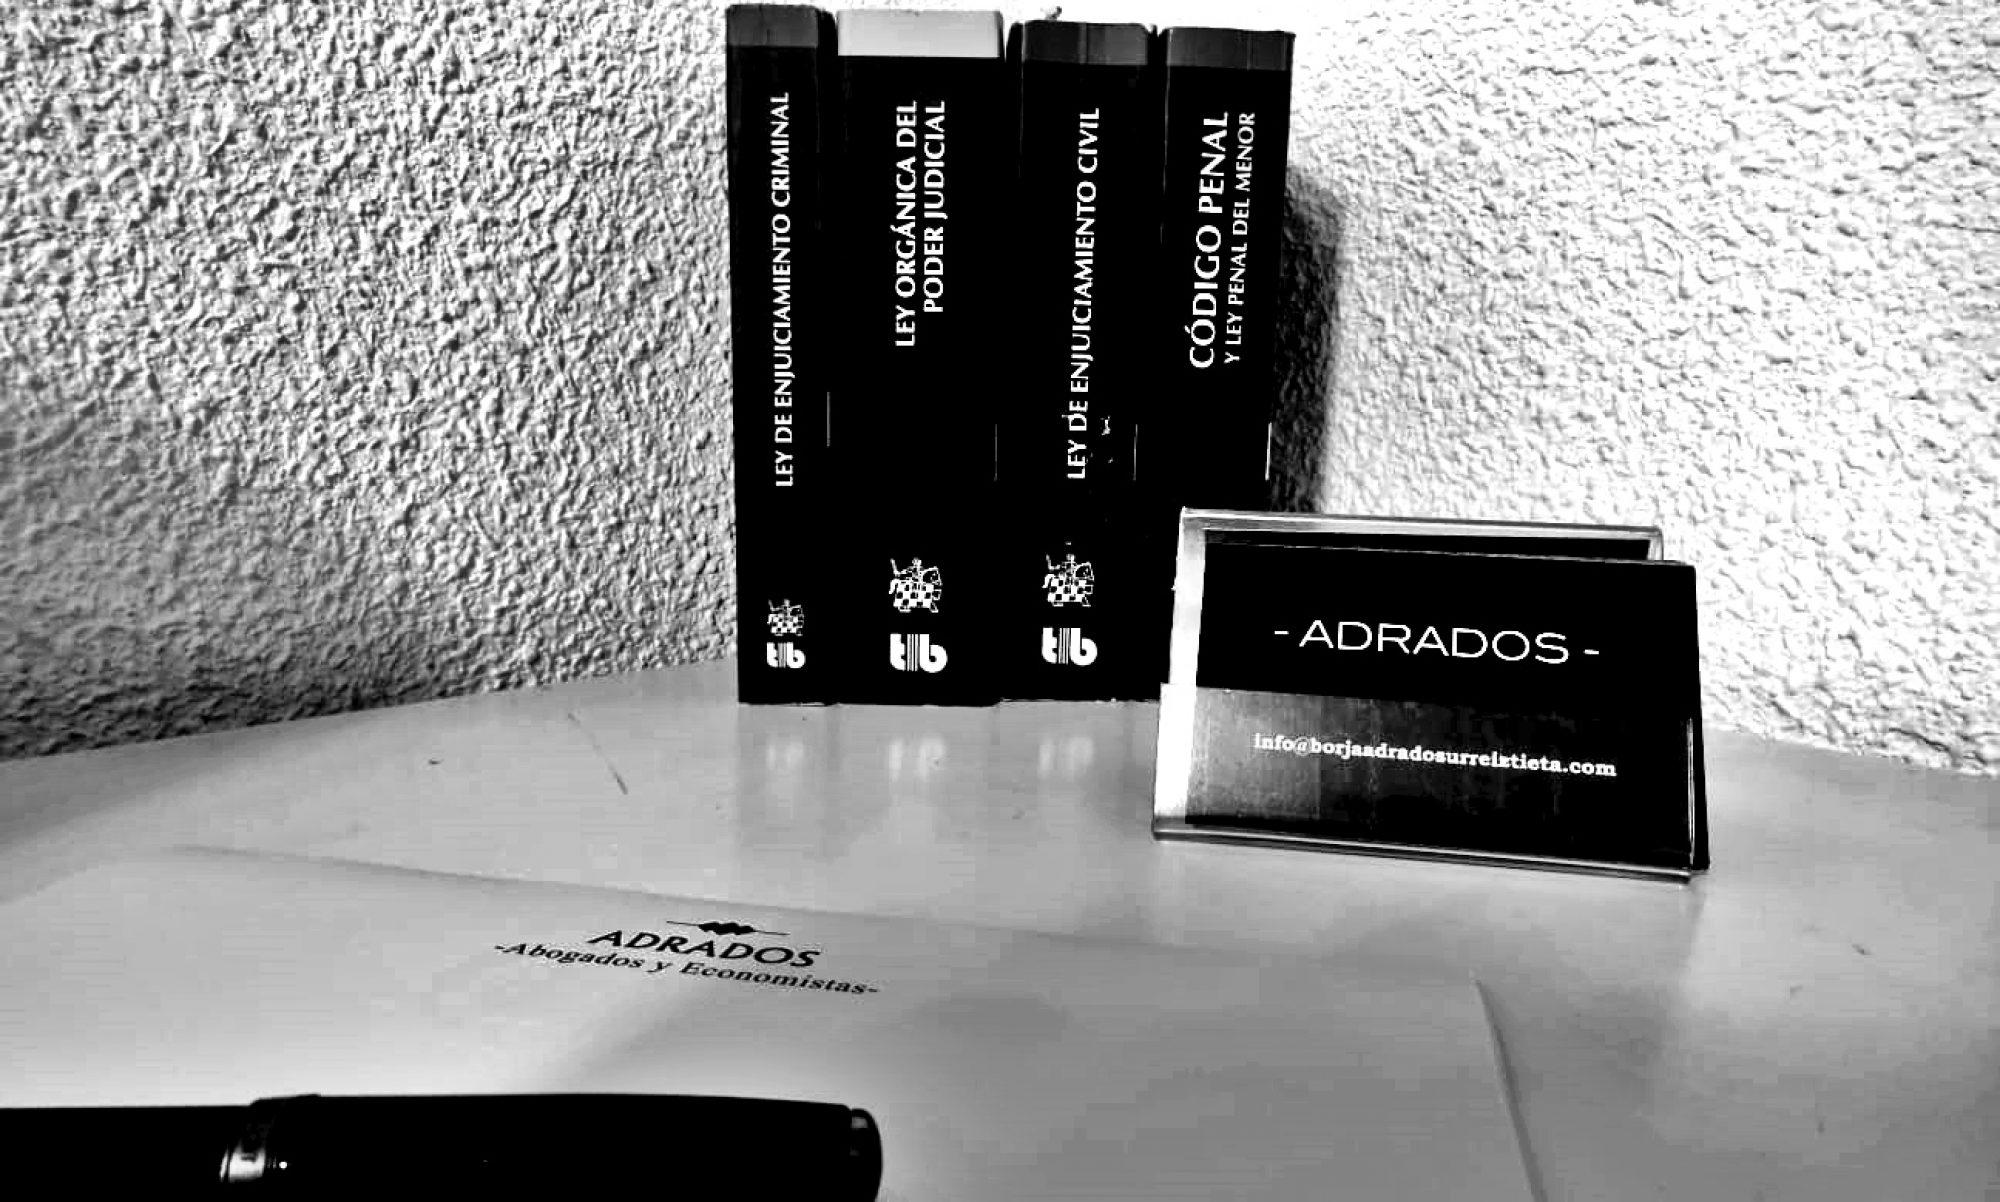 Borja Adrados Urreiztieta